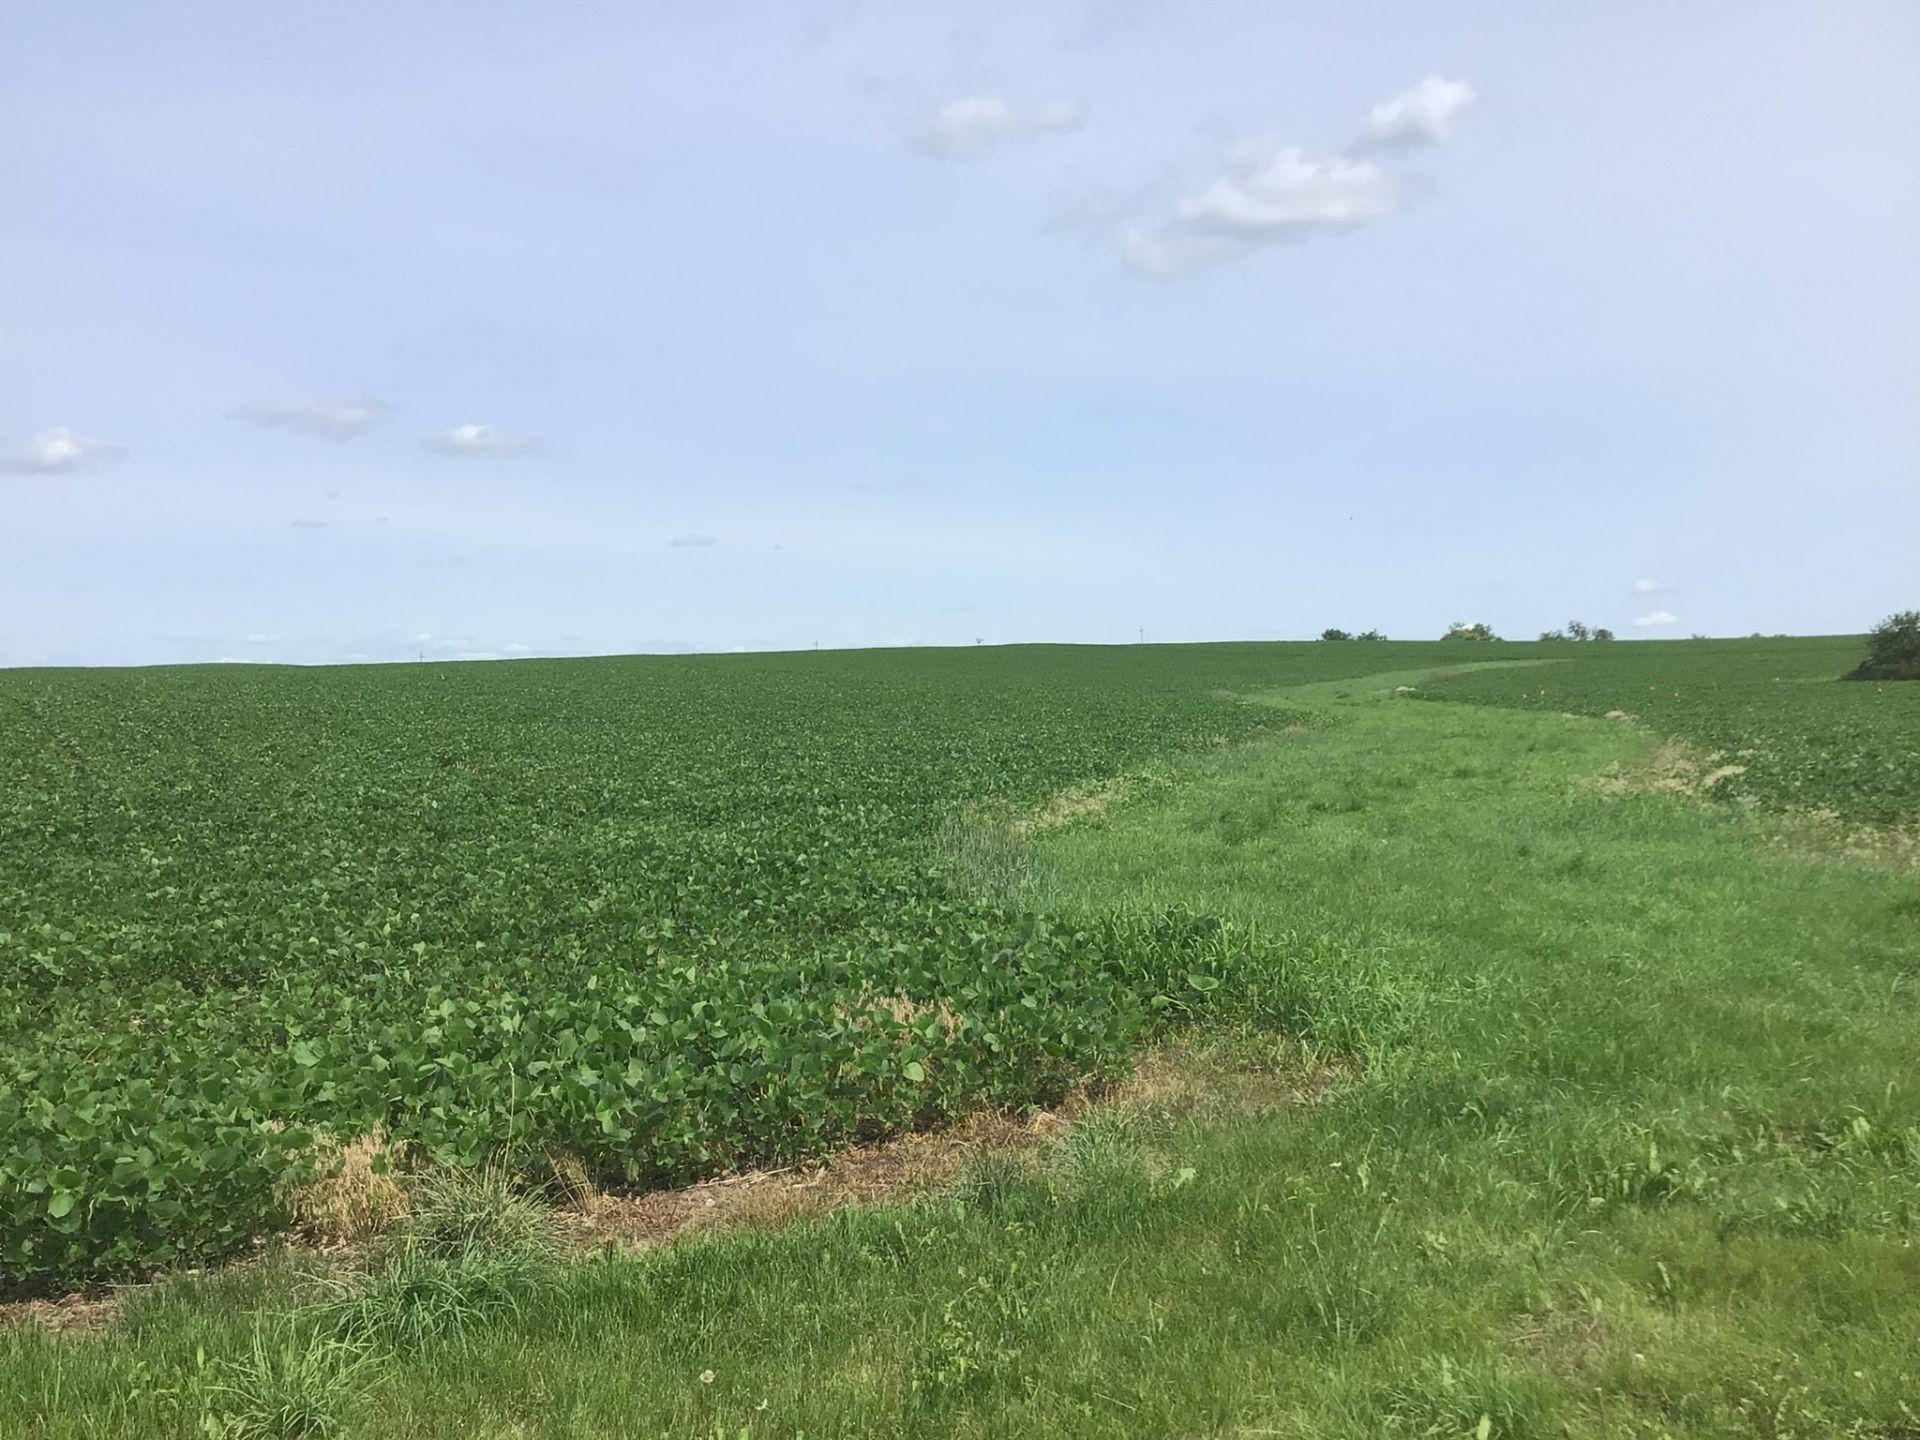 Clinton County 91 Acres M/L - Image 6 of 9